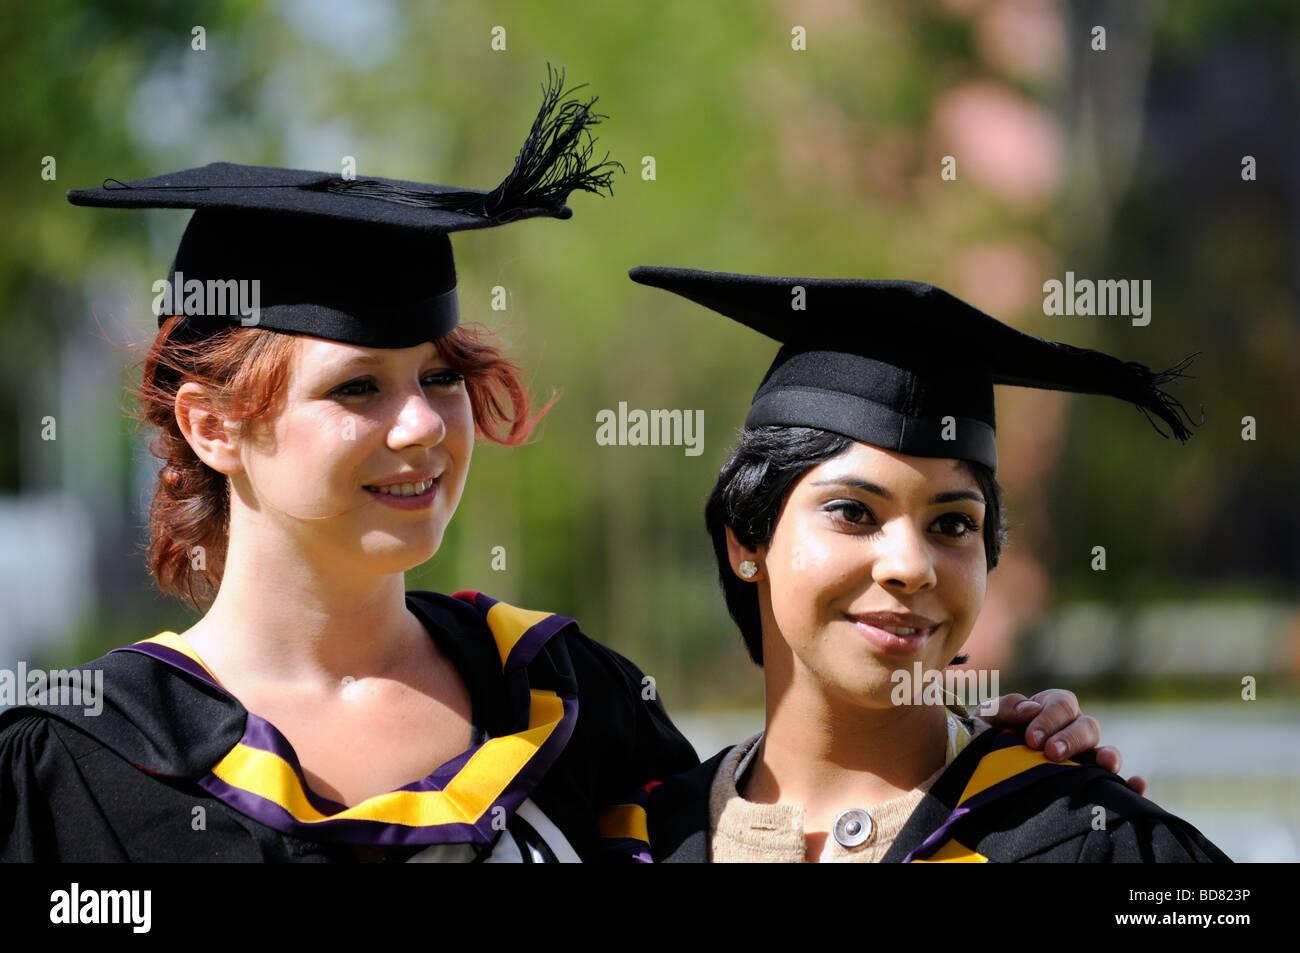 Medical School graduates from Manchester University, England, UK - Stock Image